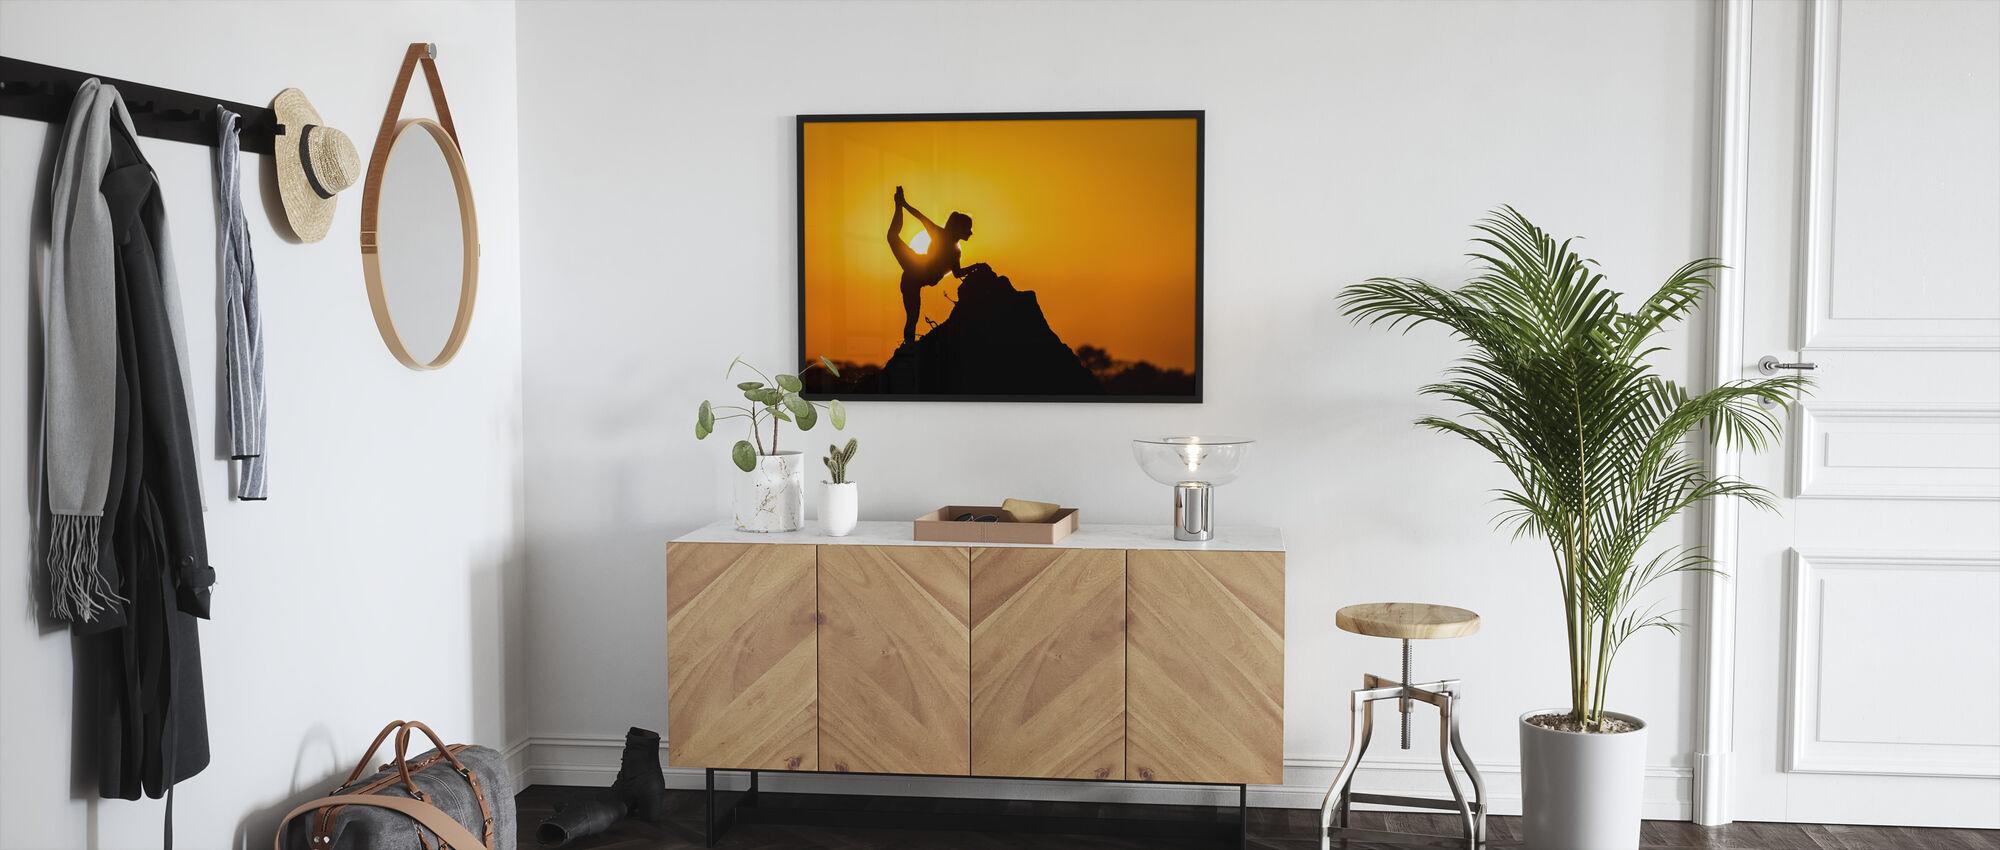 Savannah Dancer - Framed print - Hallway